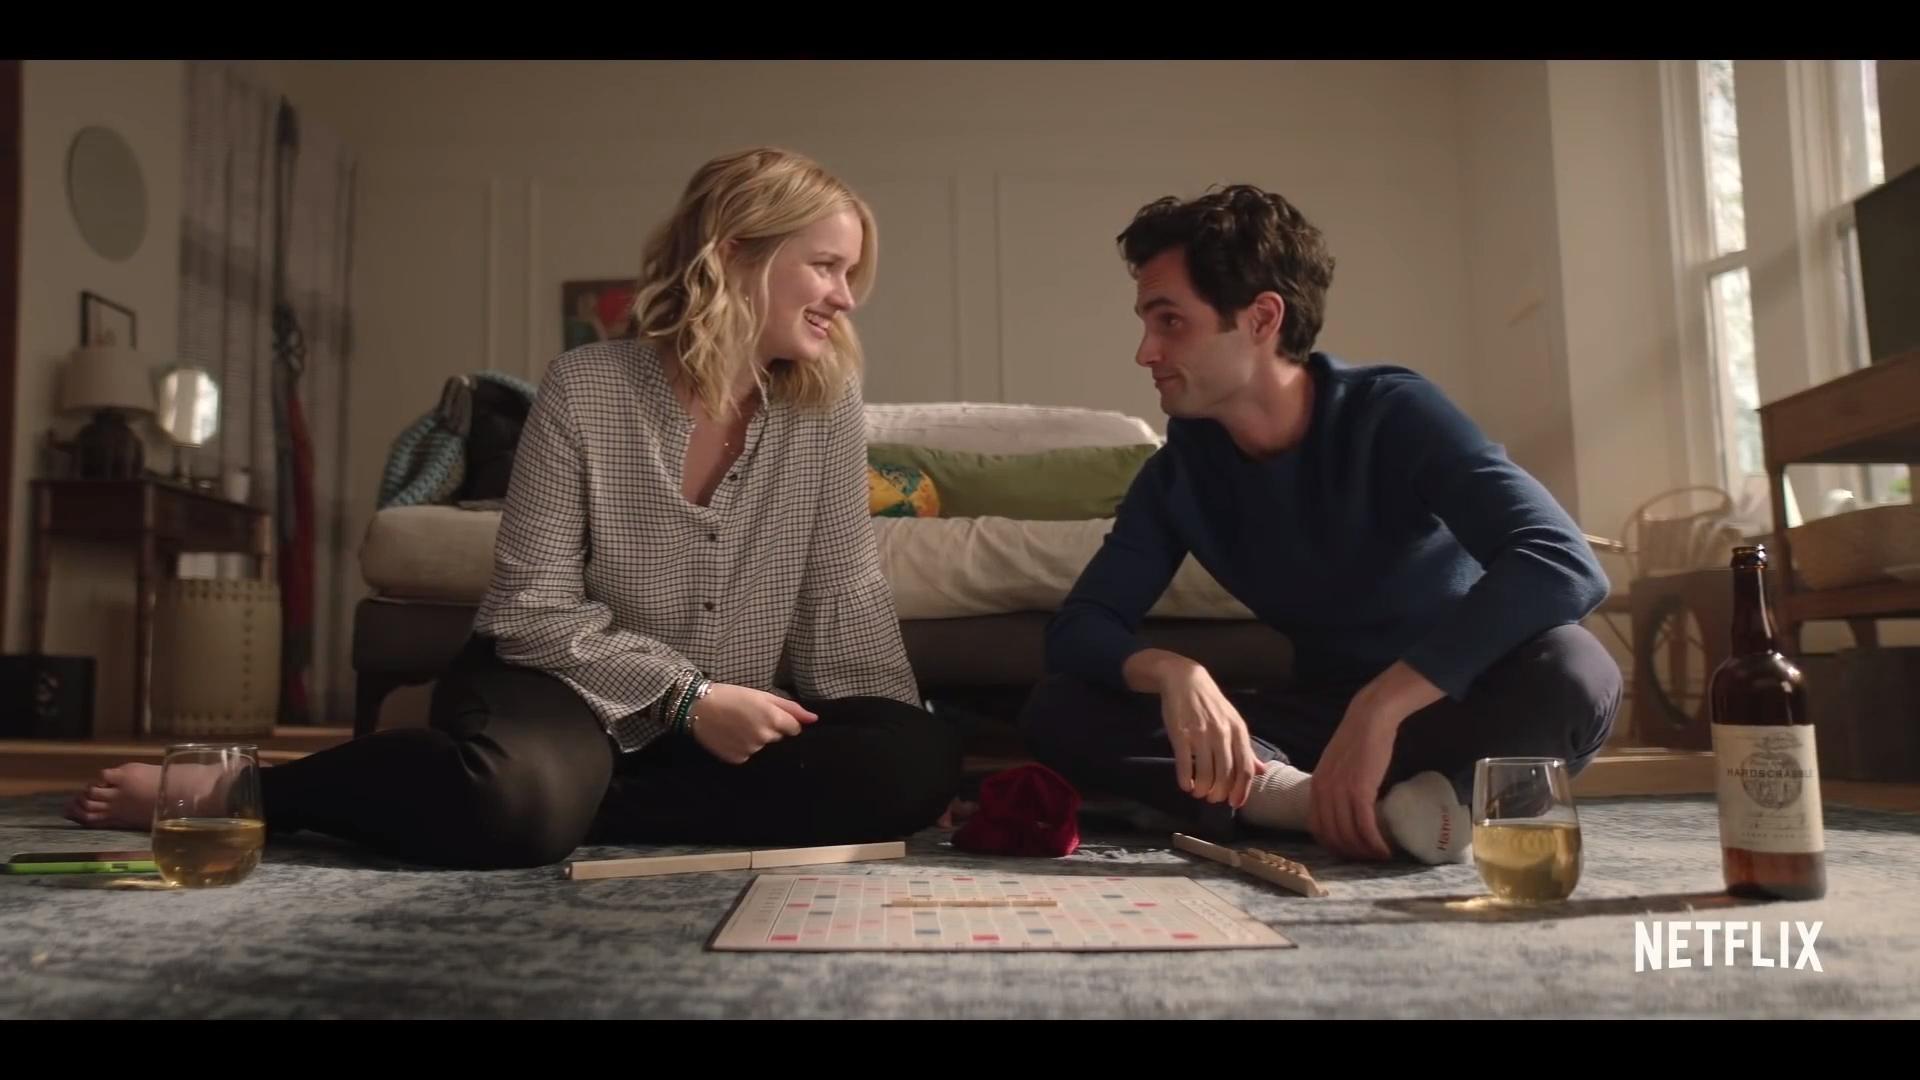 'You' Season 1 trailer starring Penn Badgley